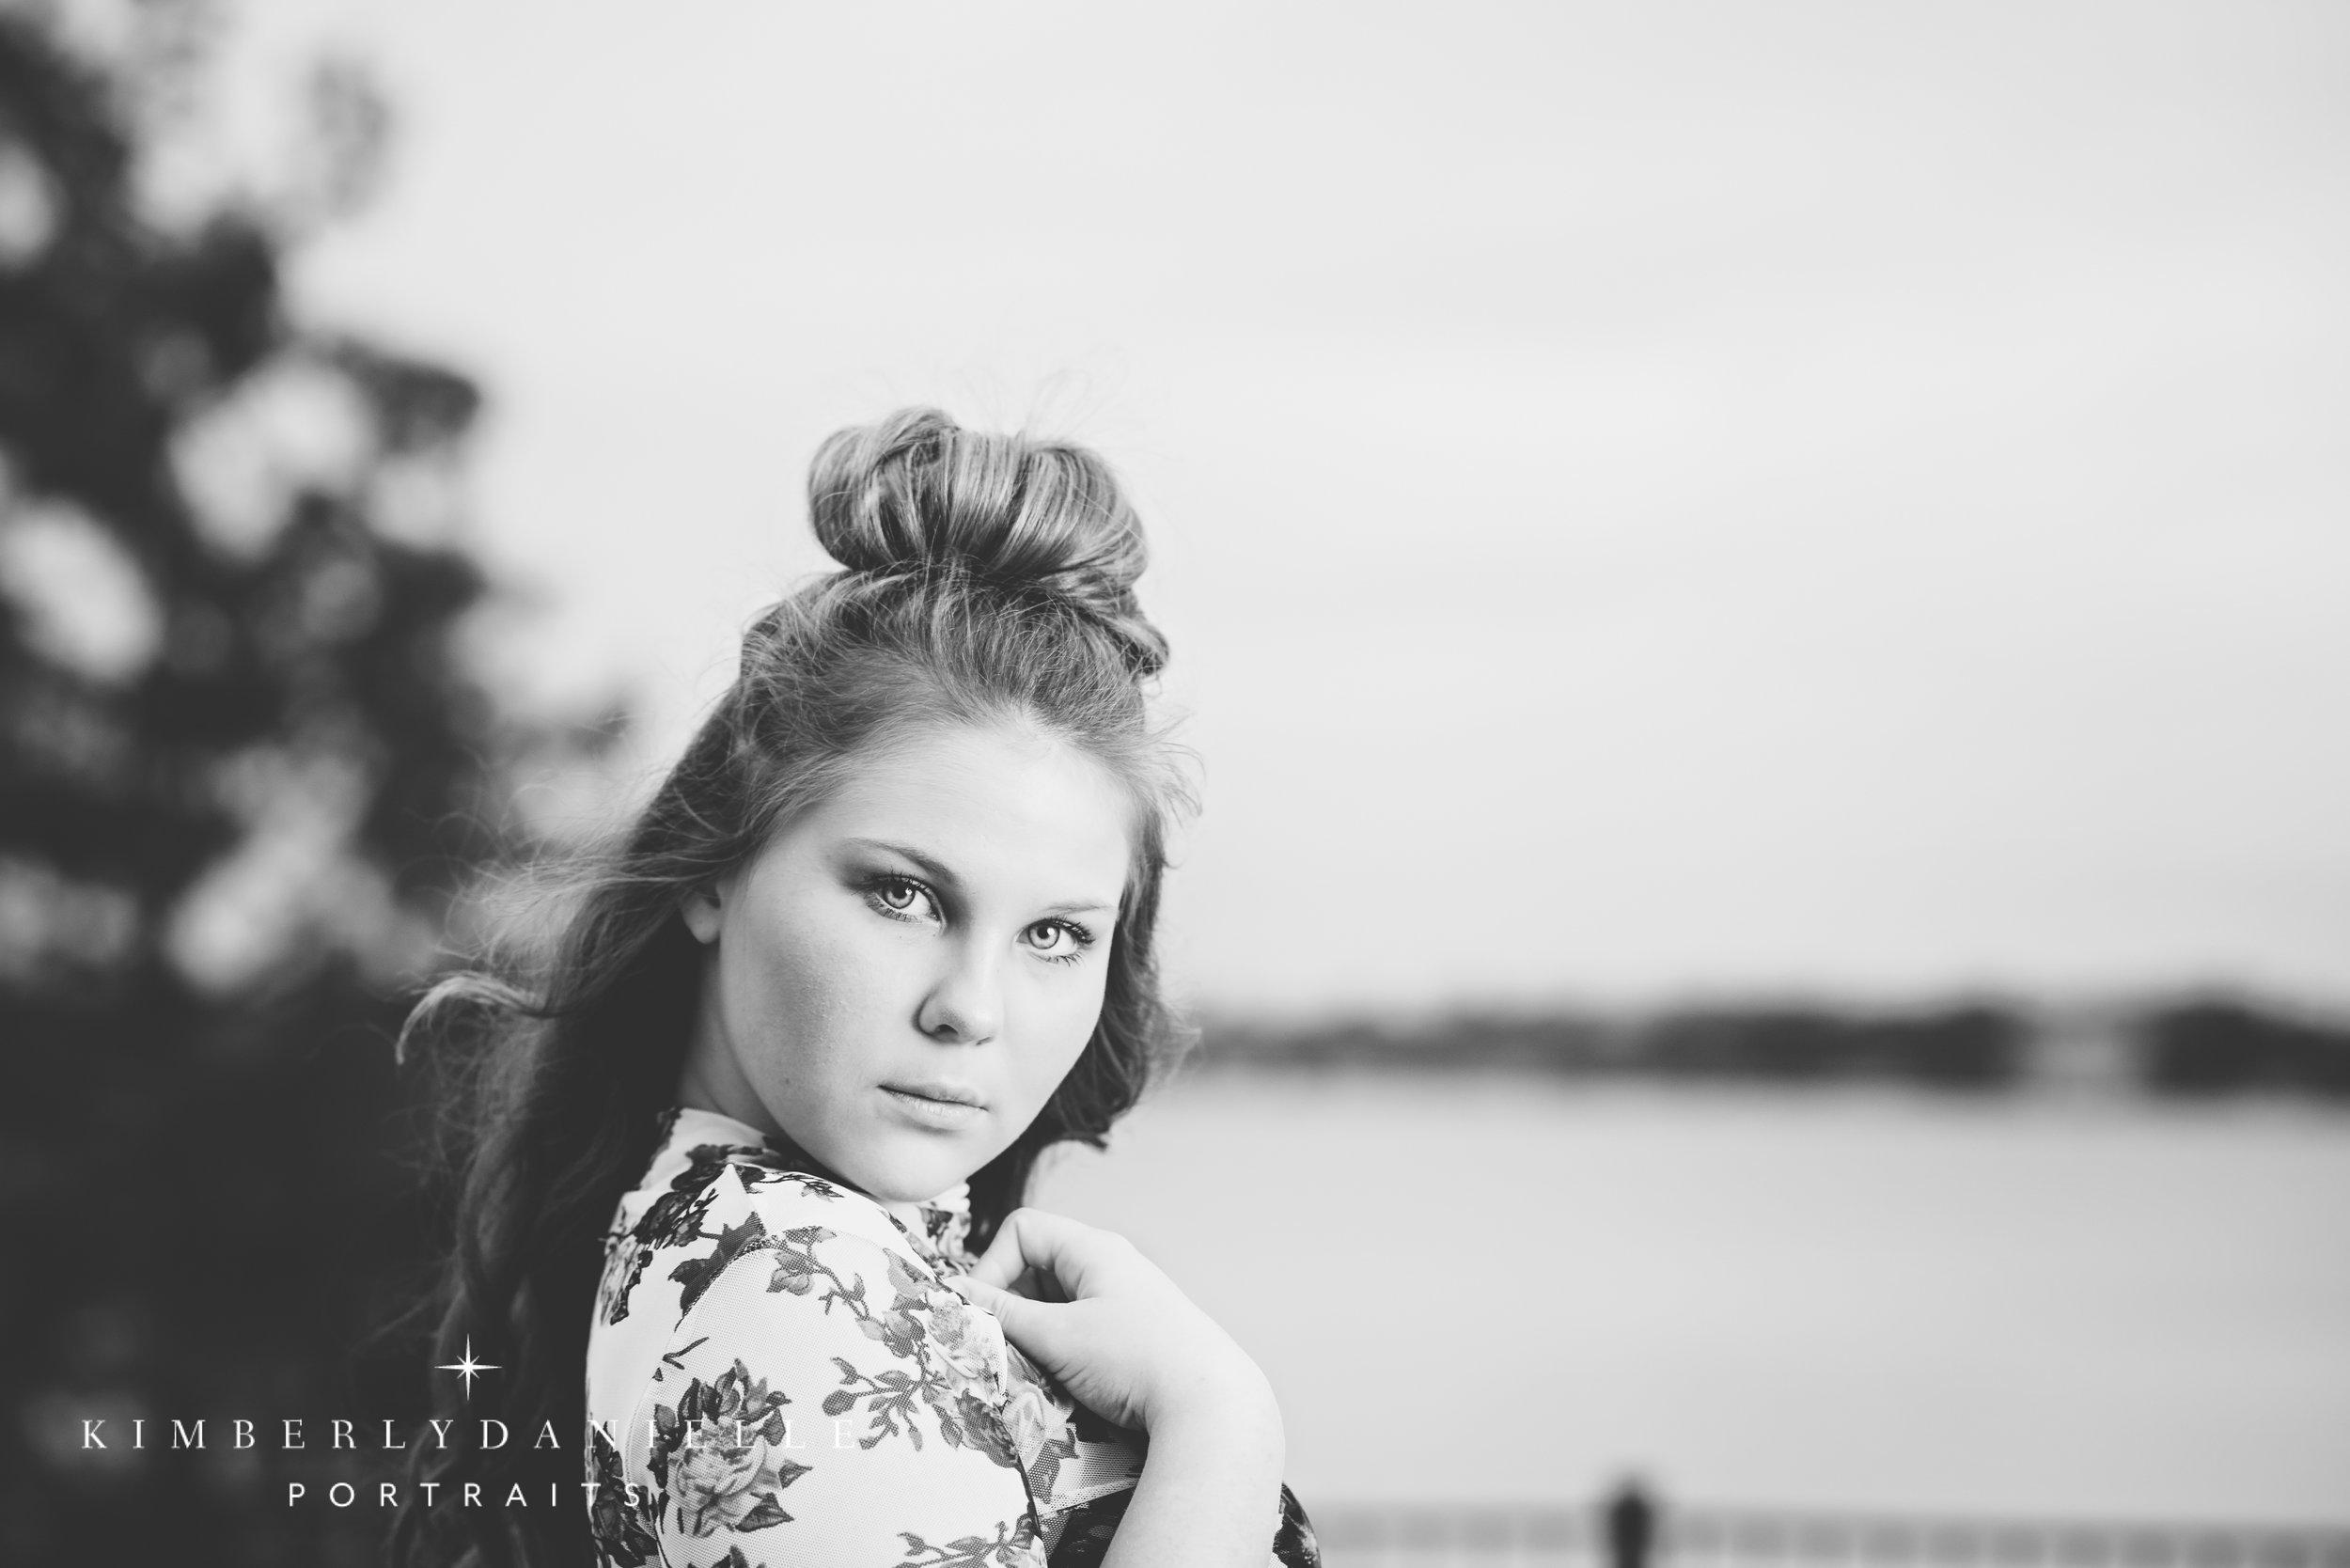 kimberly-danielle-portraits-tween-bella-068.jpg